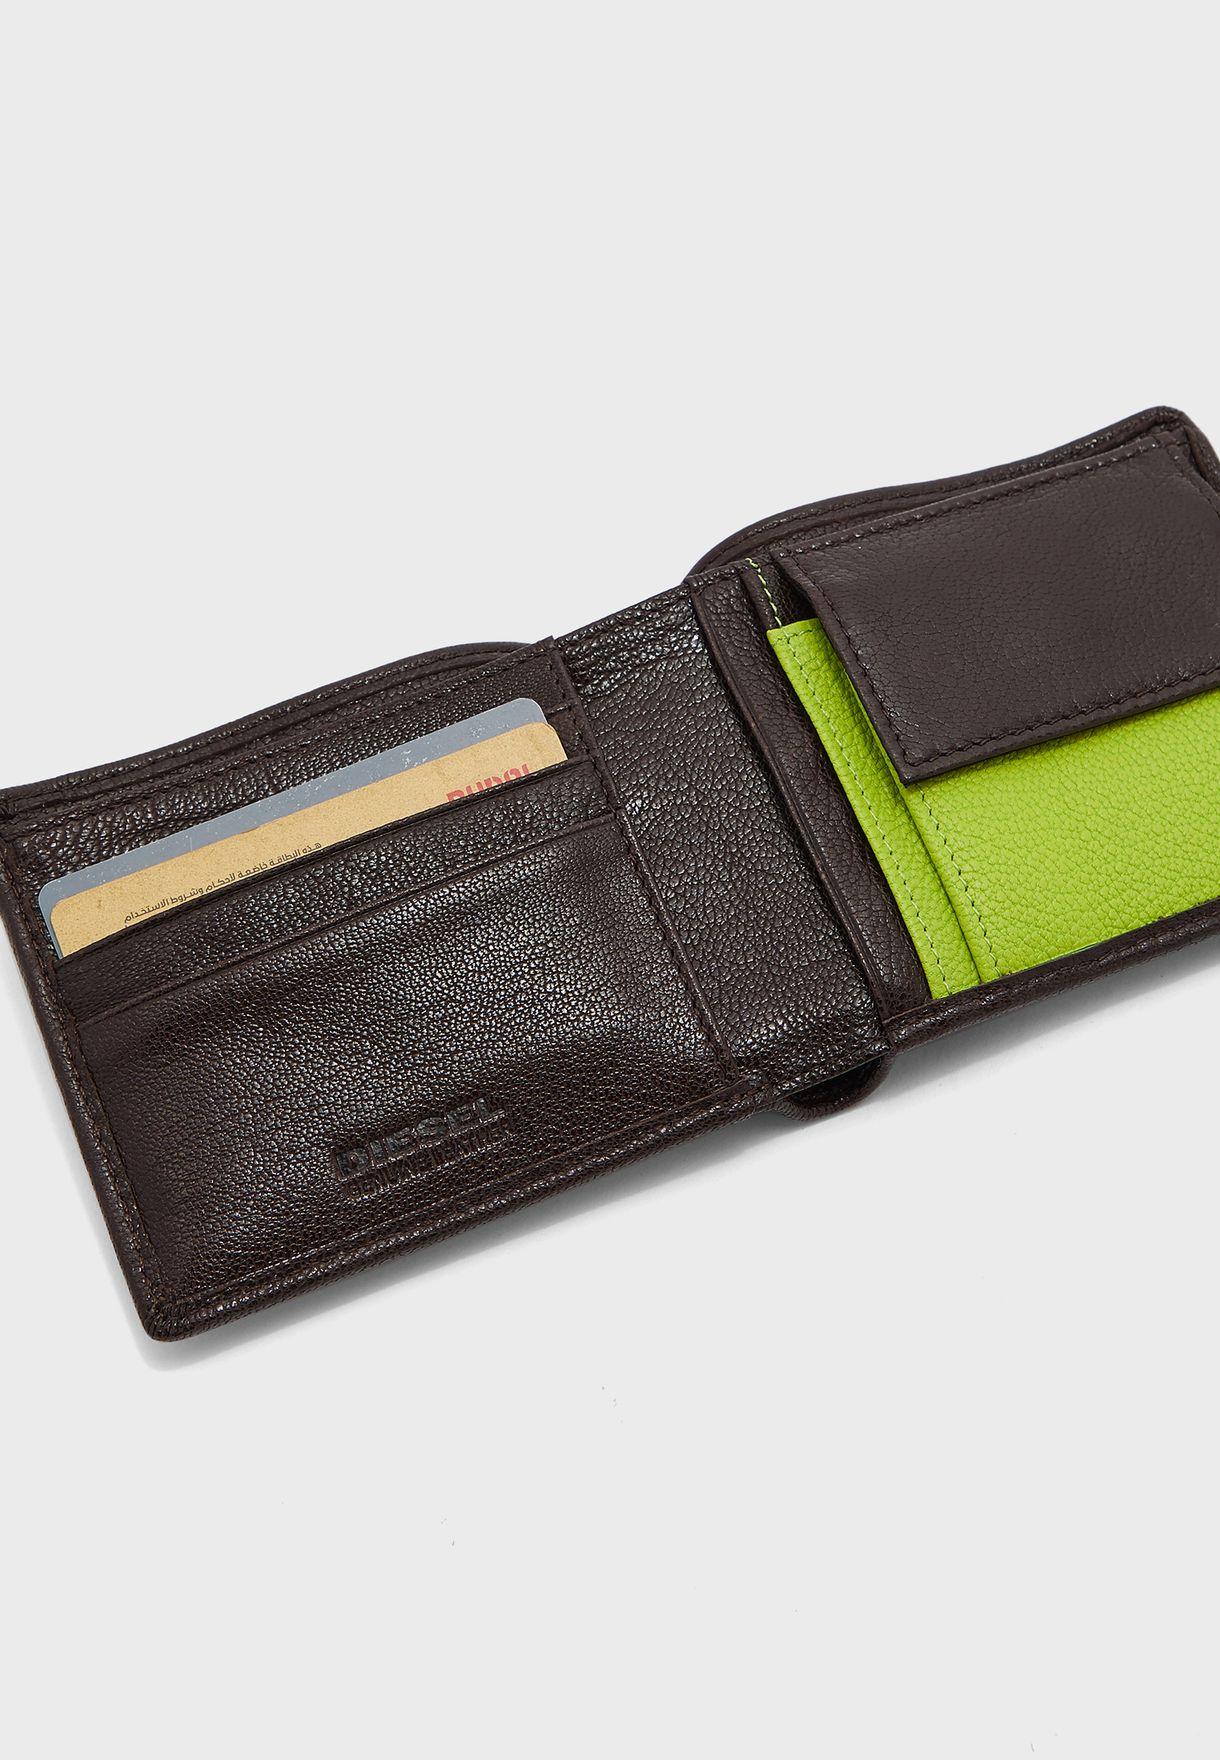 Hiresh Wallet